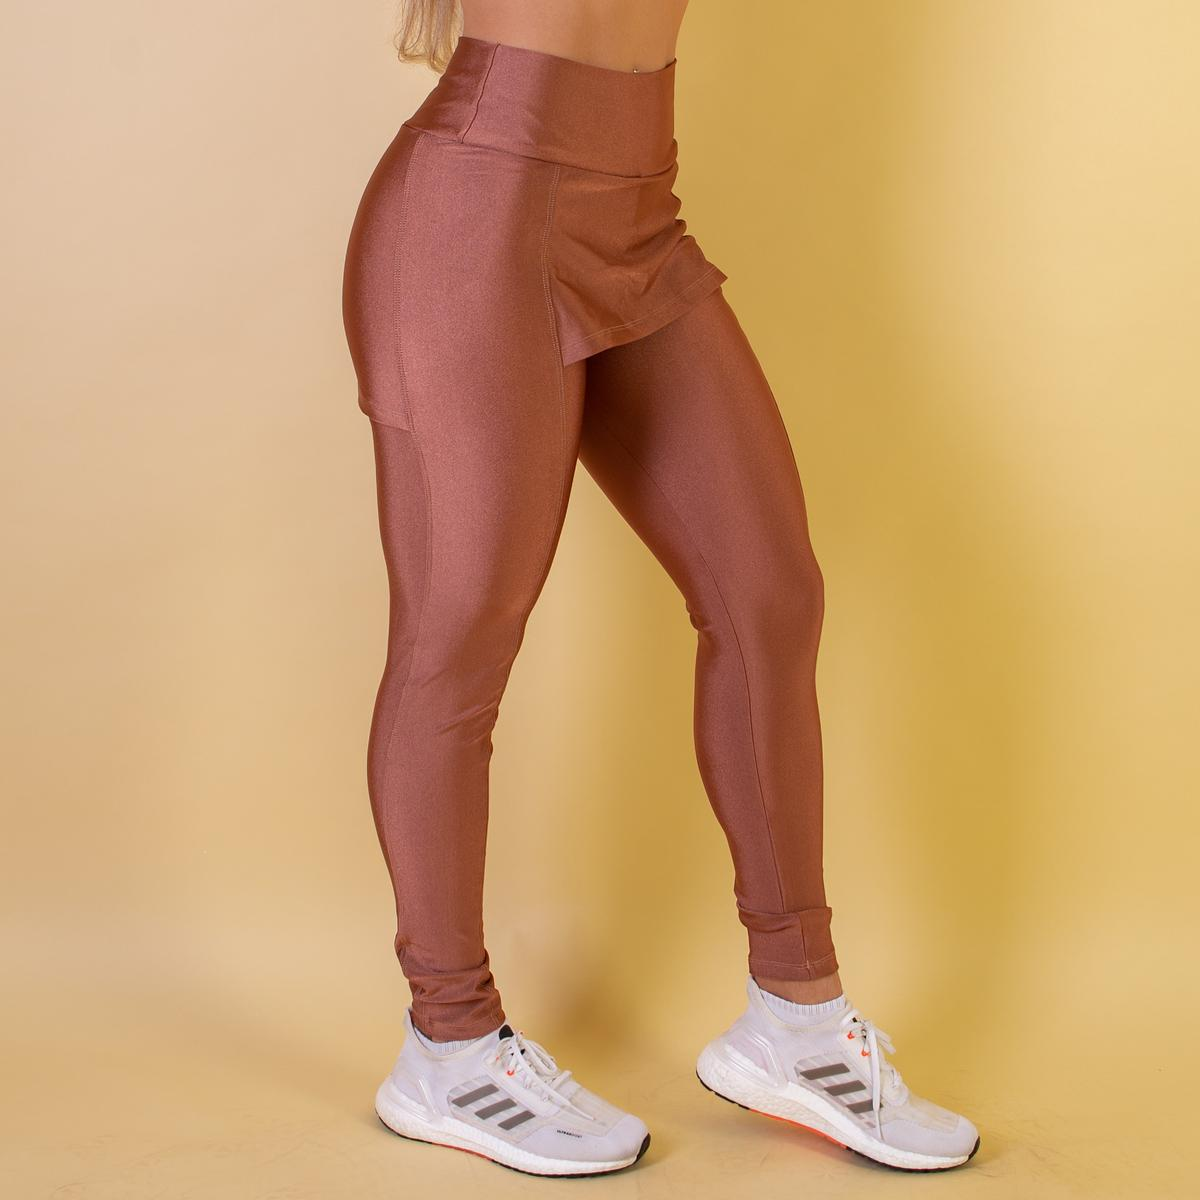 Legging Jane Seymour